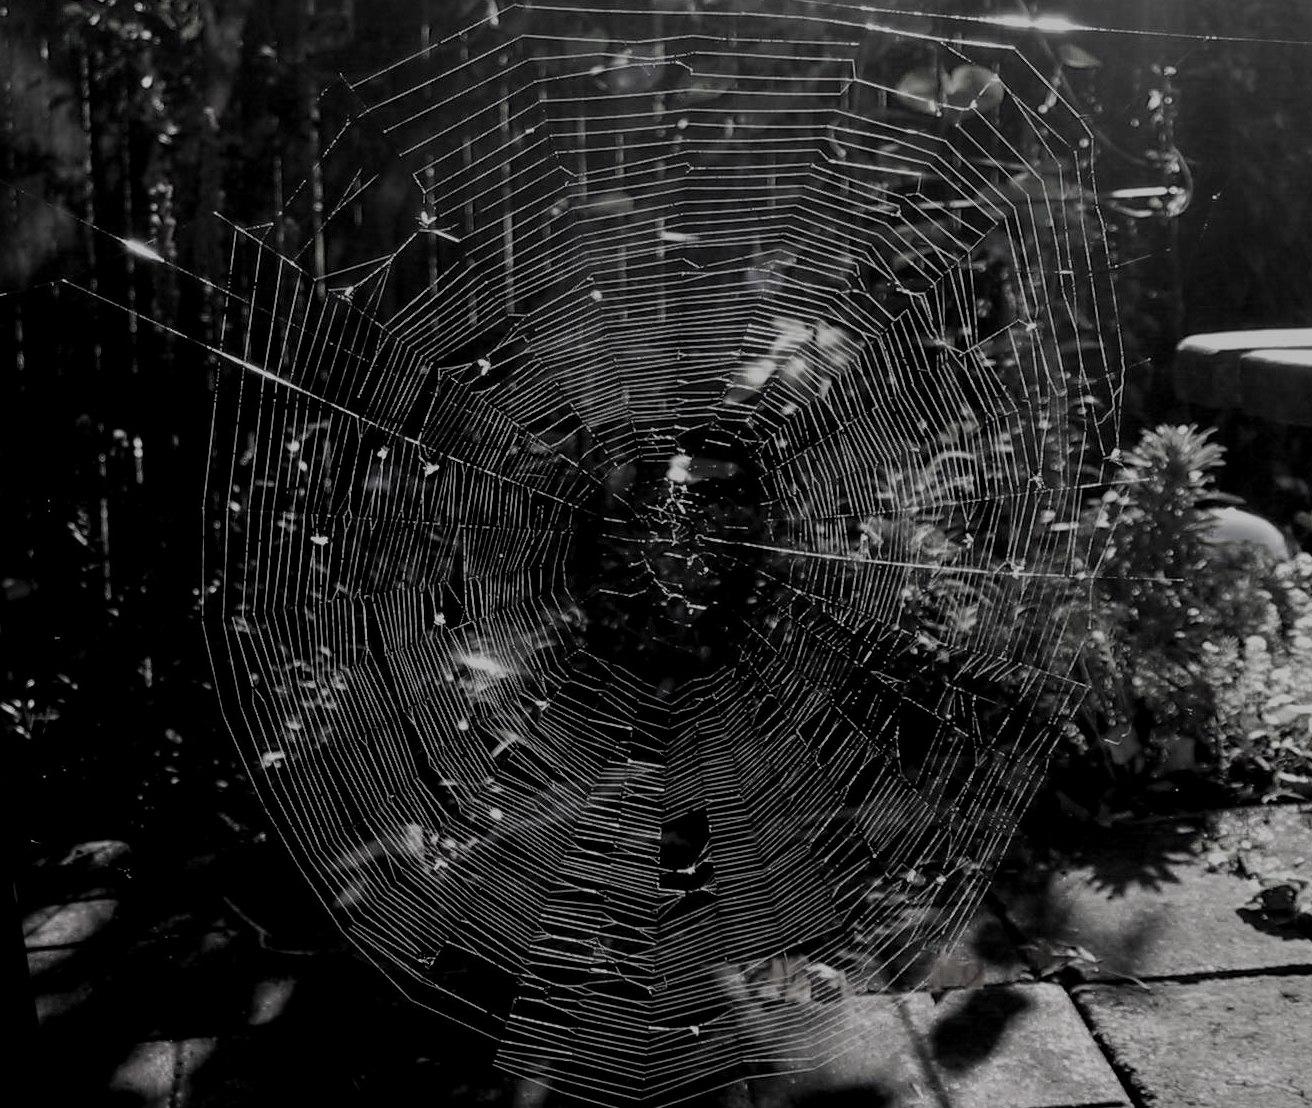 Spider Web Halloween Decorations: The Moonlight Gardener: Spider Web Art